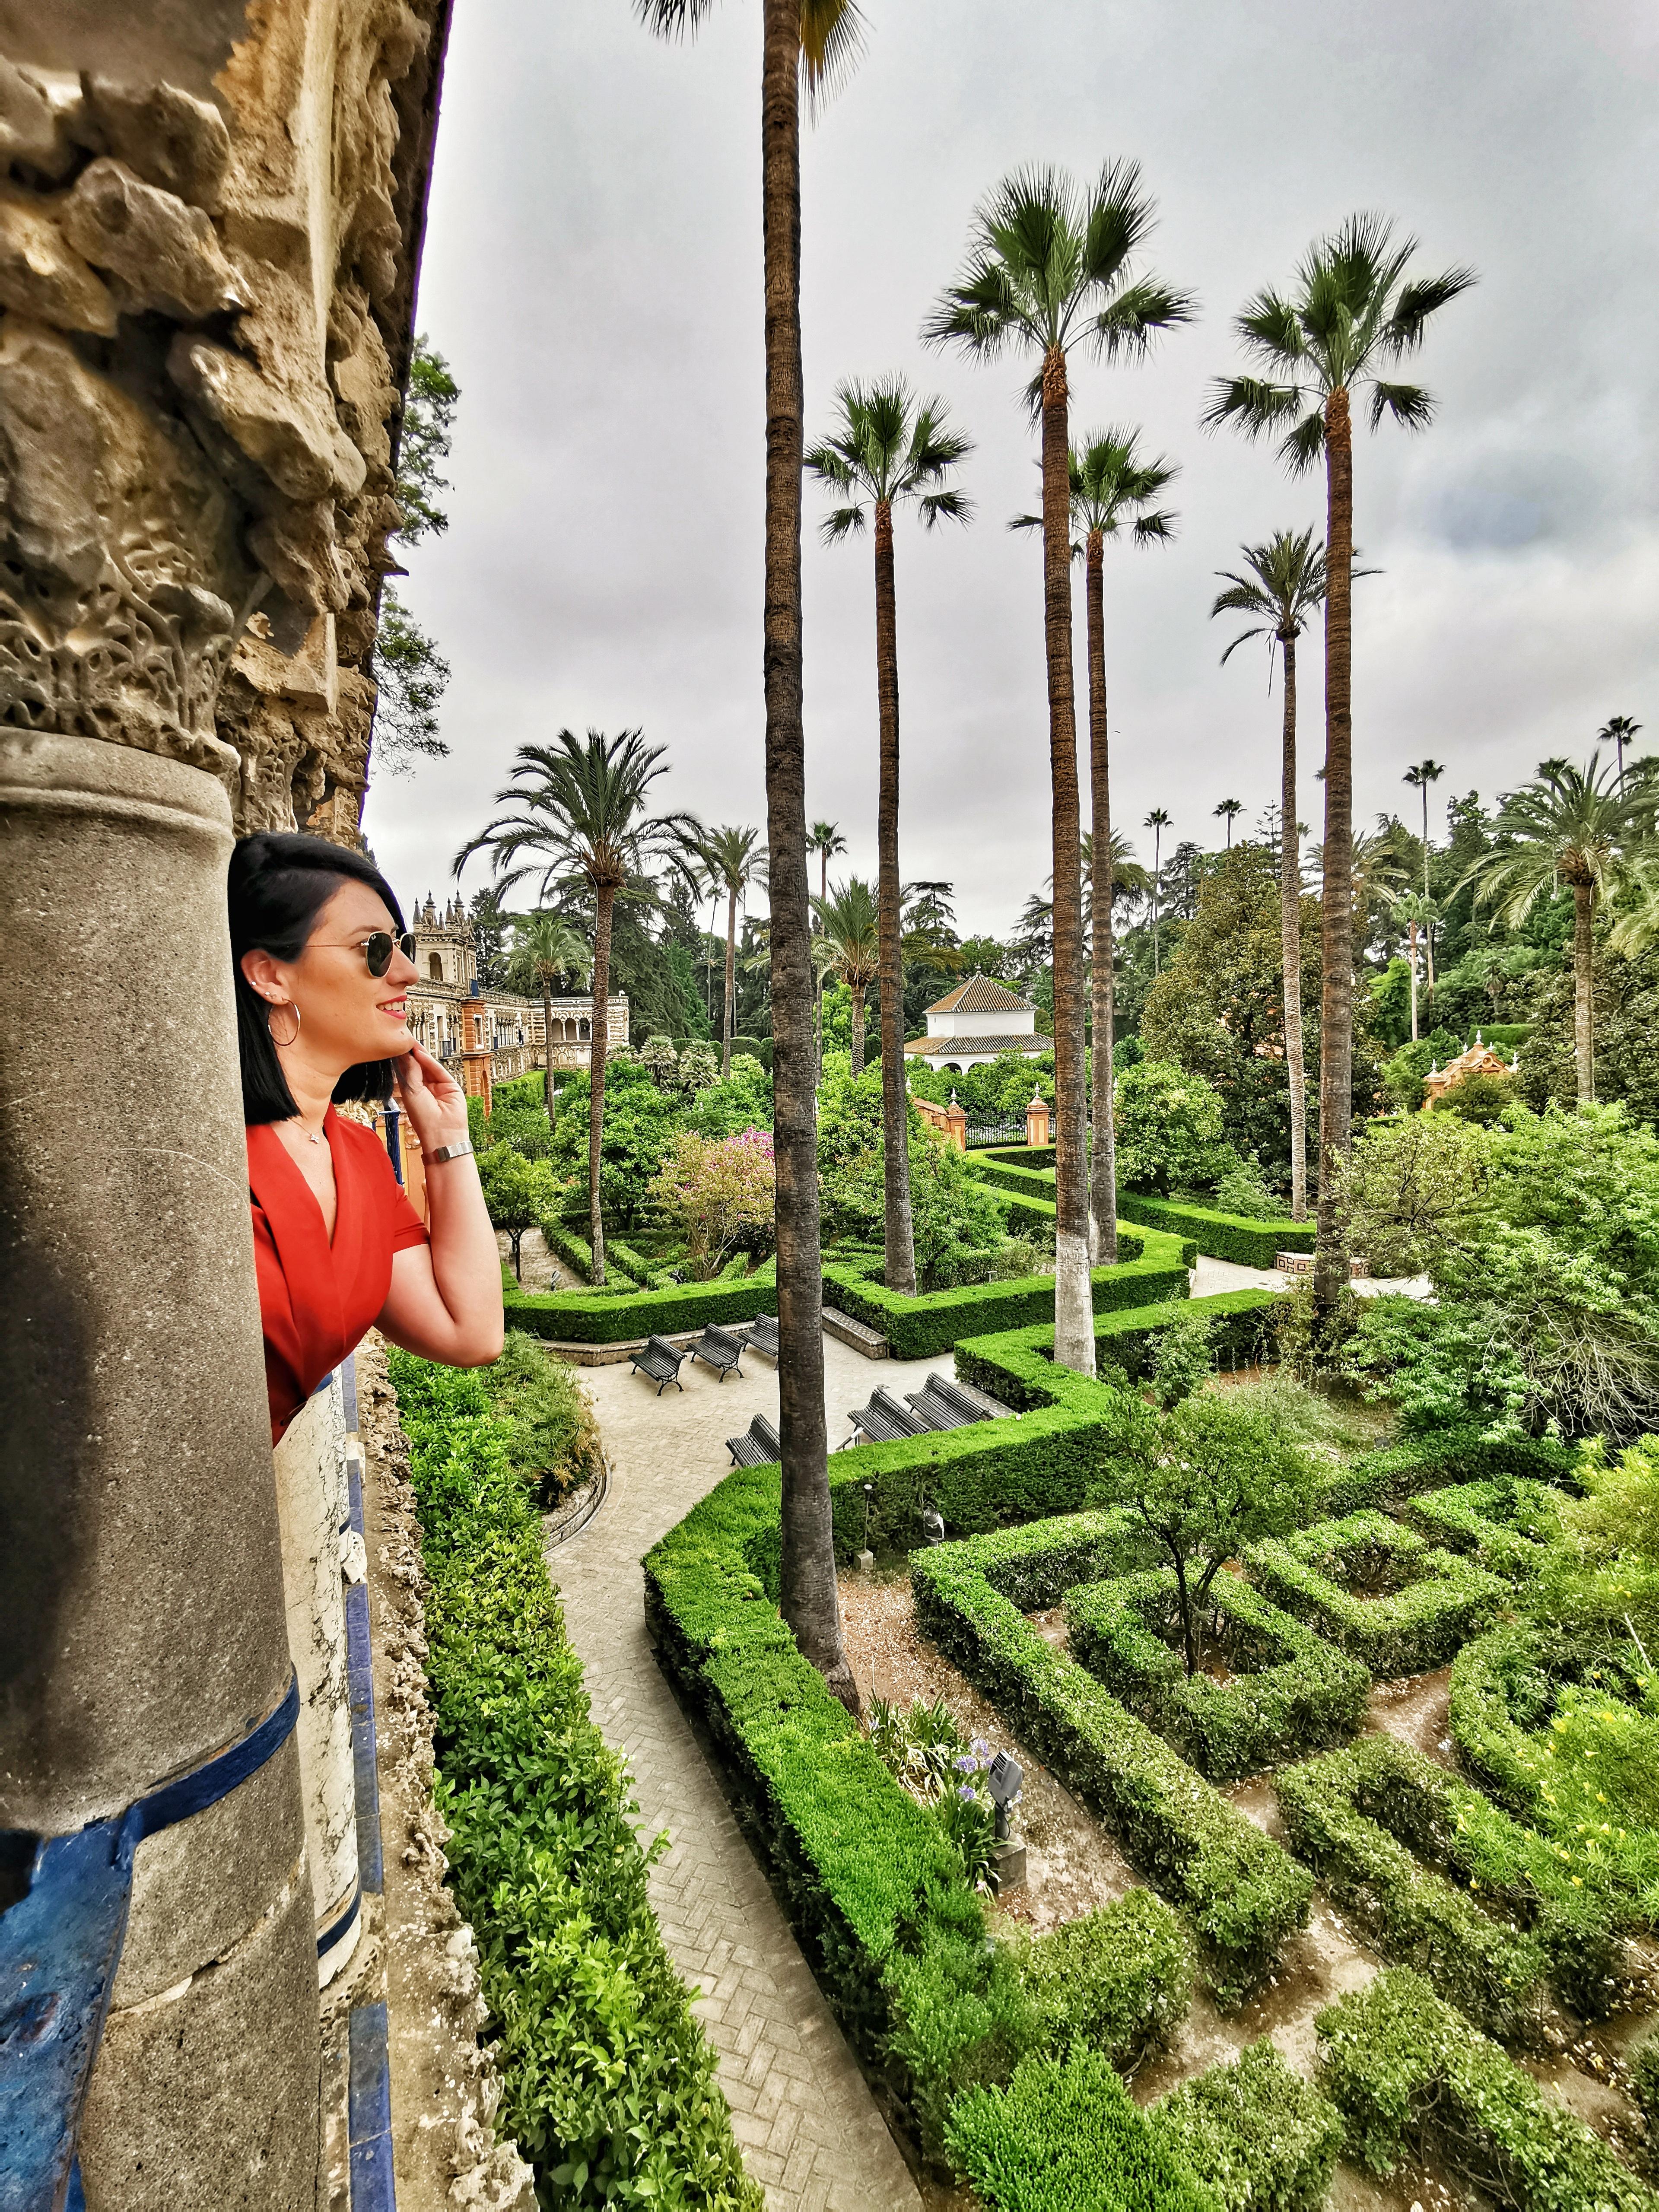 Alcazar_dorneGameOfthrones_video_gardens